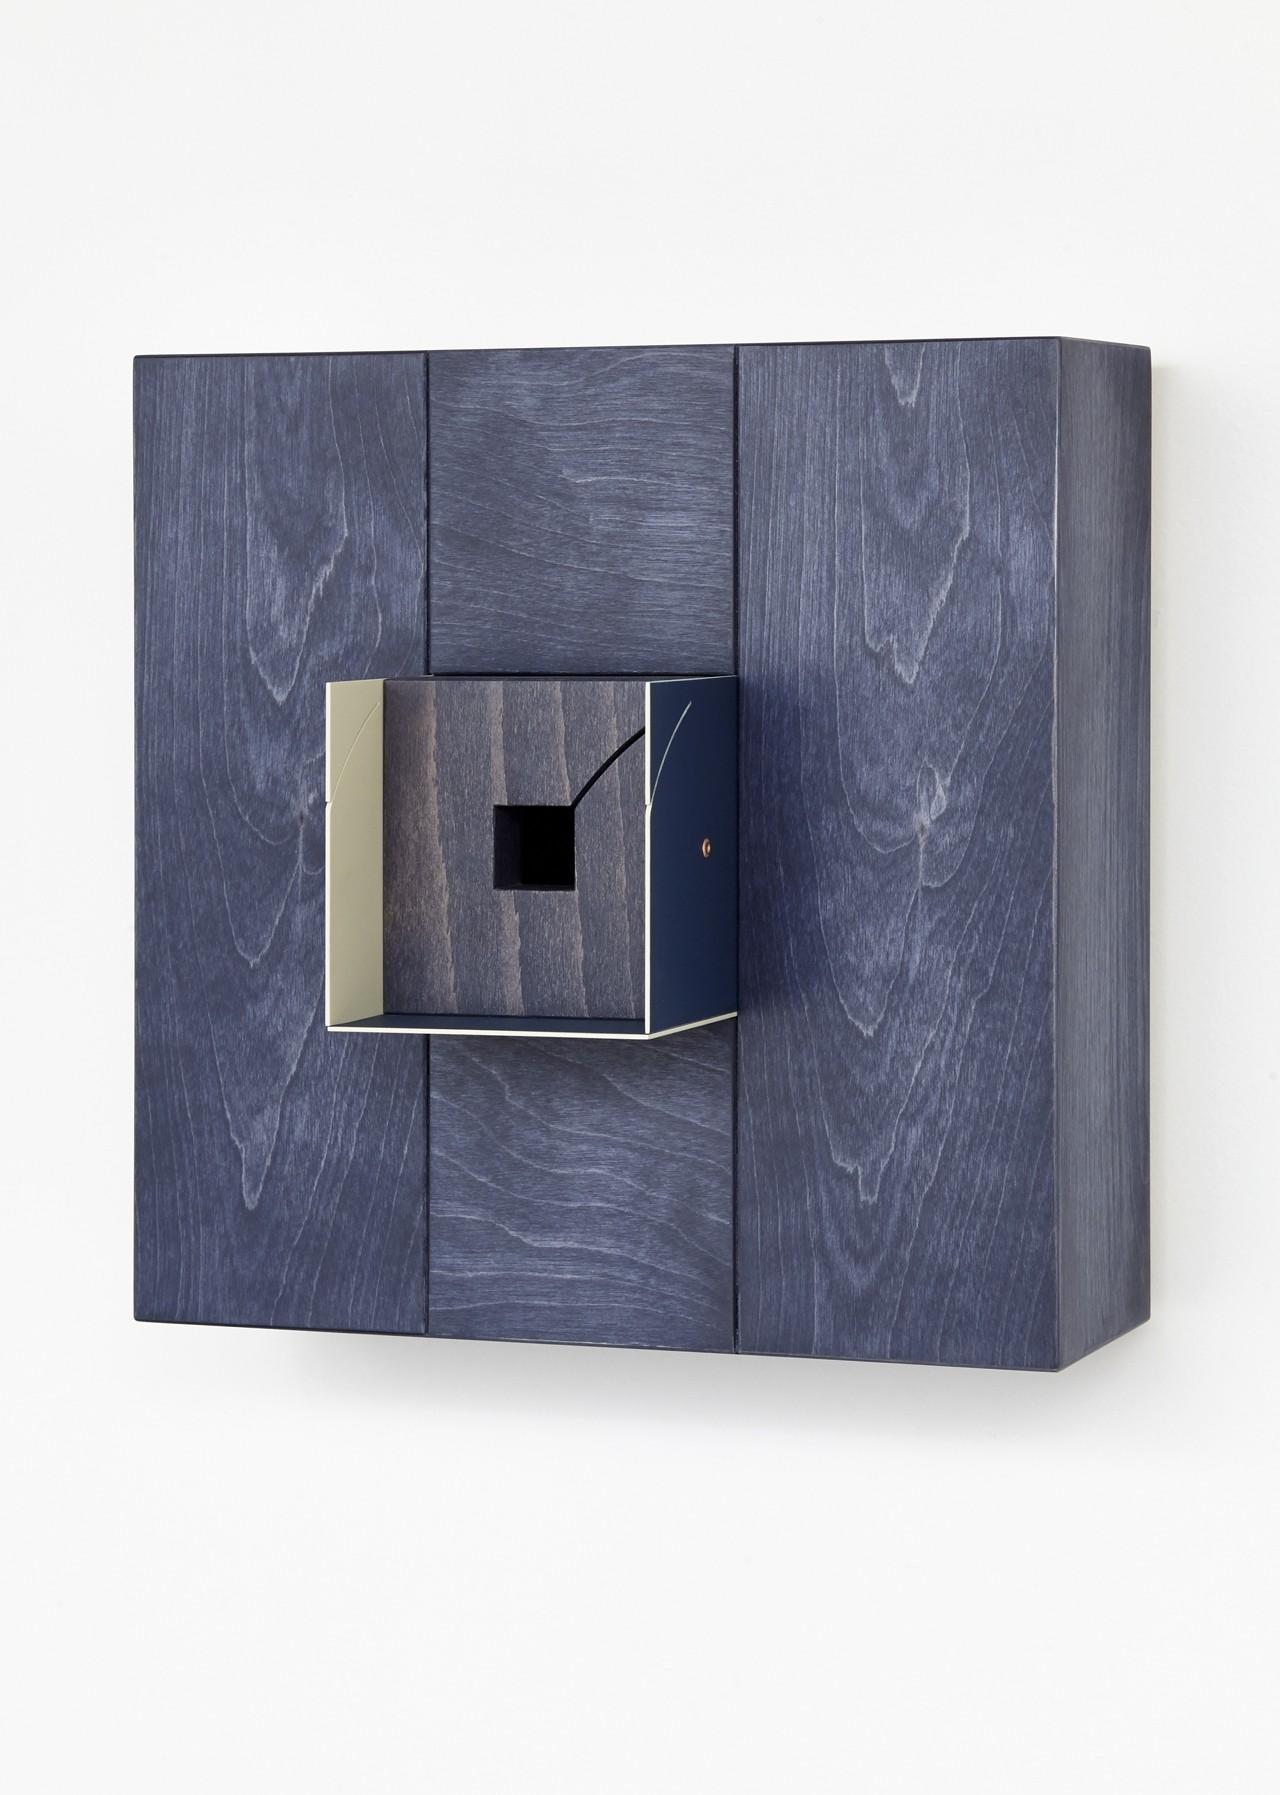 Matt Paweski, Wall Work (With Pop Out), 2015